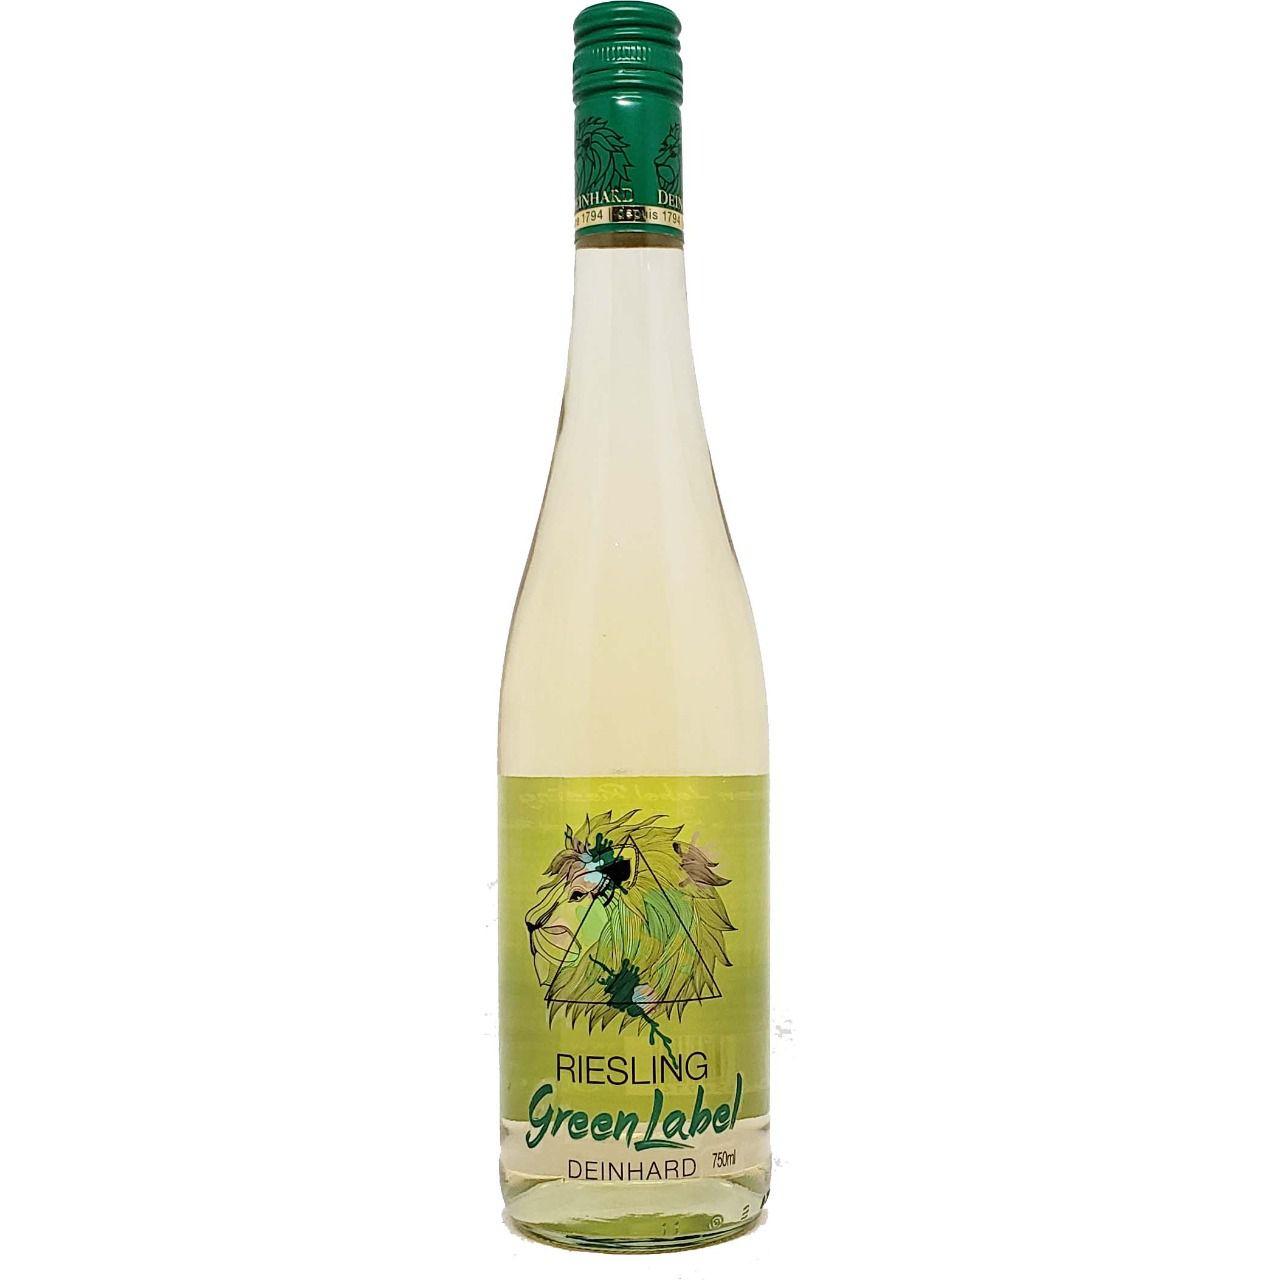 Vinho Branco Deinhard Green Label Riesling - 750ml -